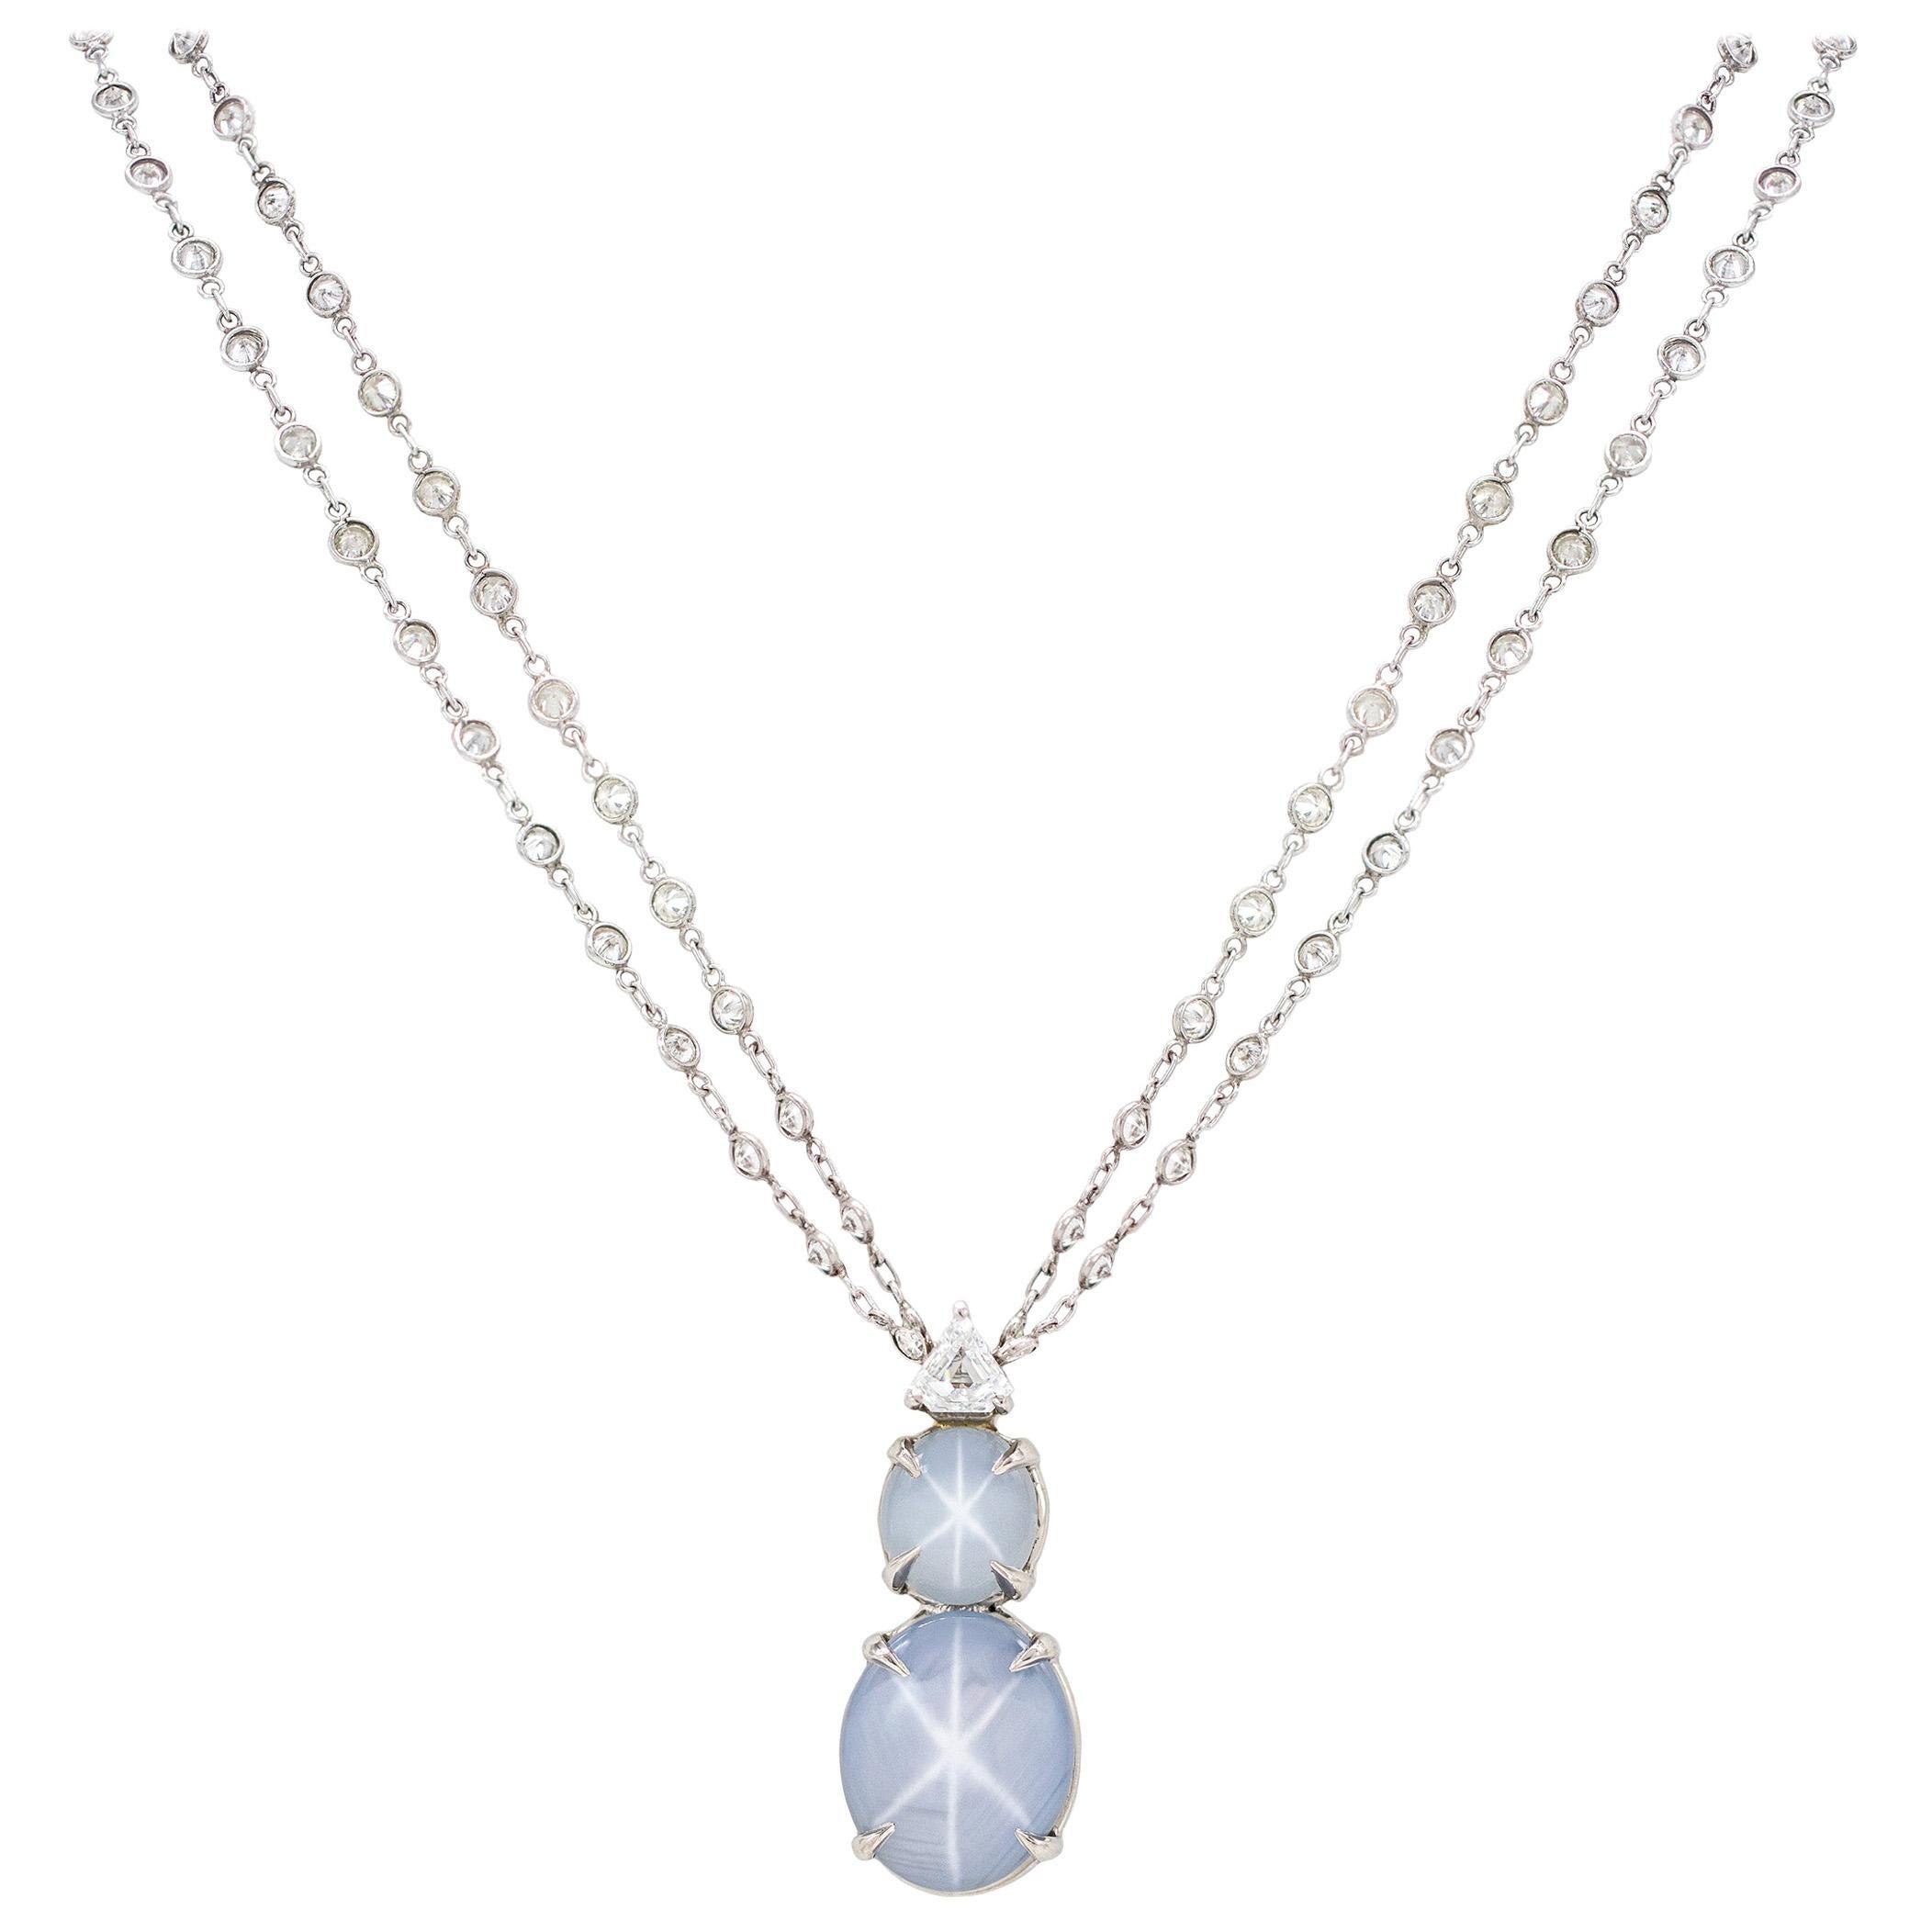 AGL Cert 16.22 Carat NO HEAT Natural Star Sapphire and Diamond Necklace Plat